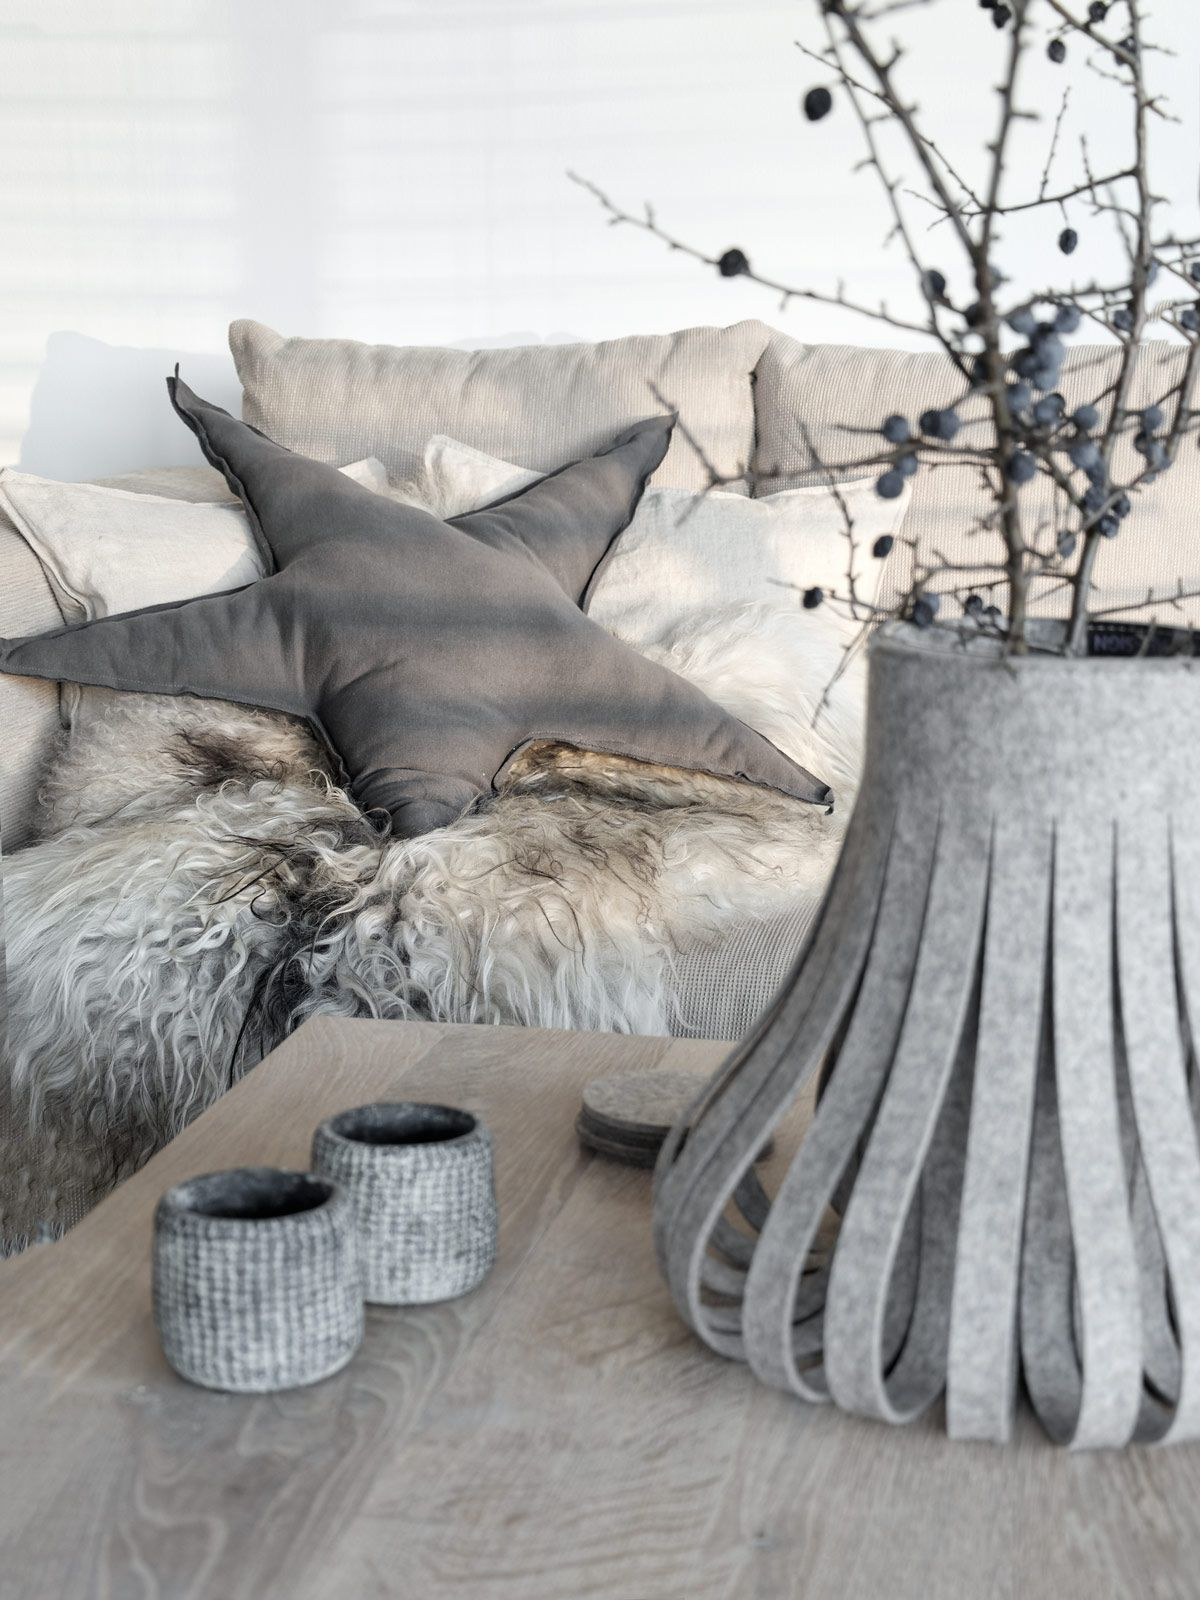 wohnaccessoires n hen medi t schchen n hen f r viel farbe im grau e v avec n hen f r. Black Bedroom Furniture Sets. Home Design Ideas